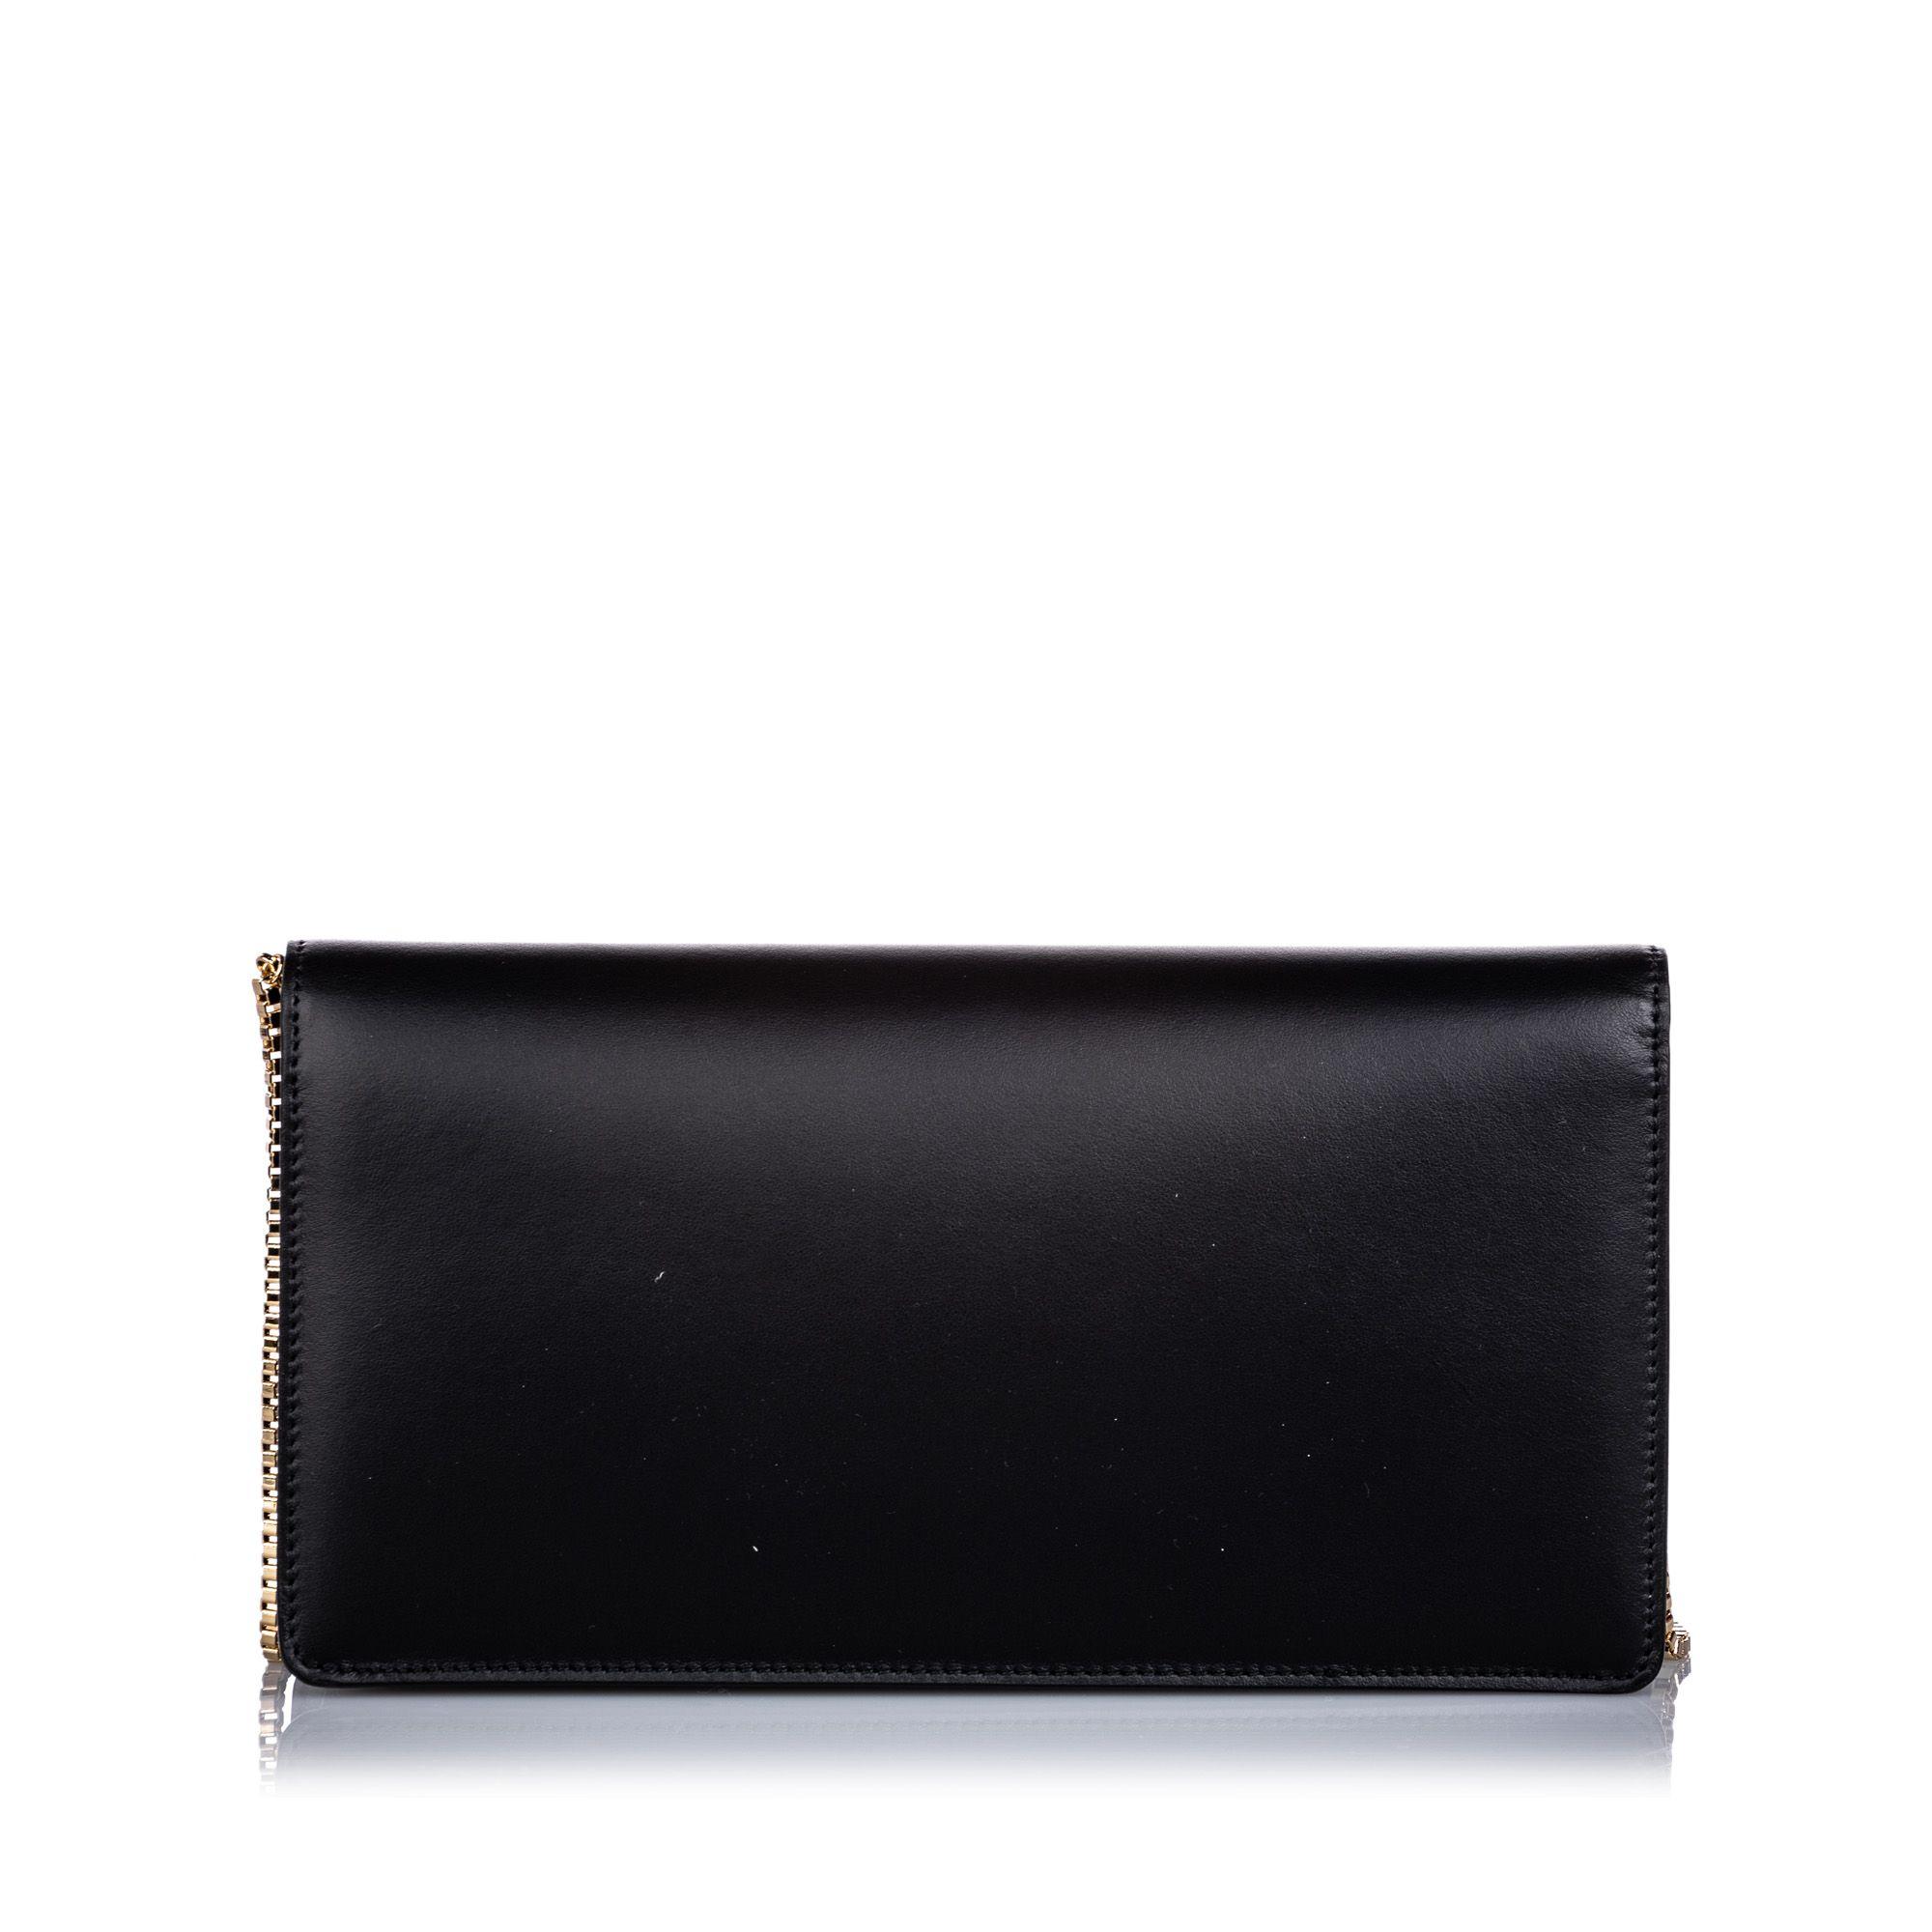 Vintage Ferragamo Thalia Leather Baguette Black